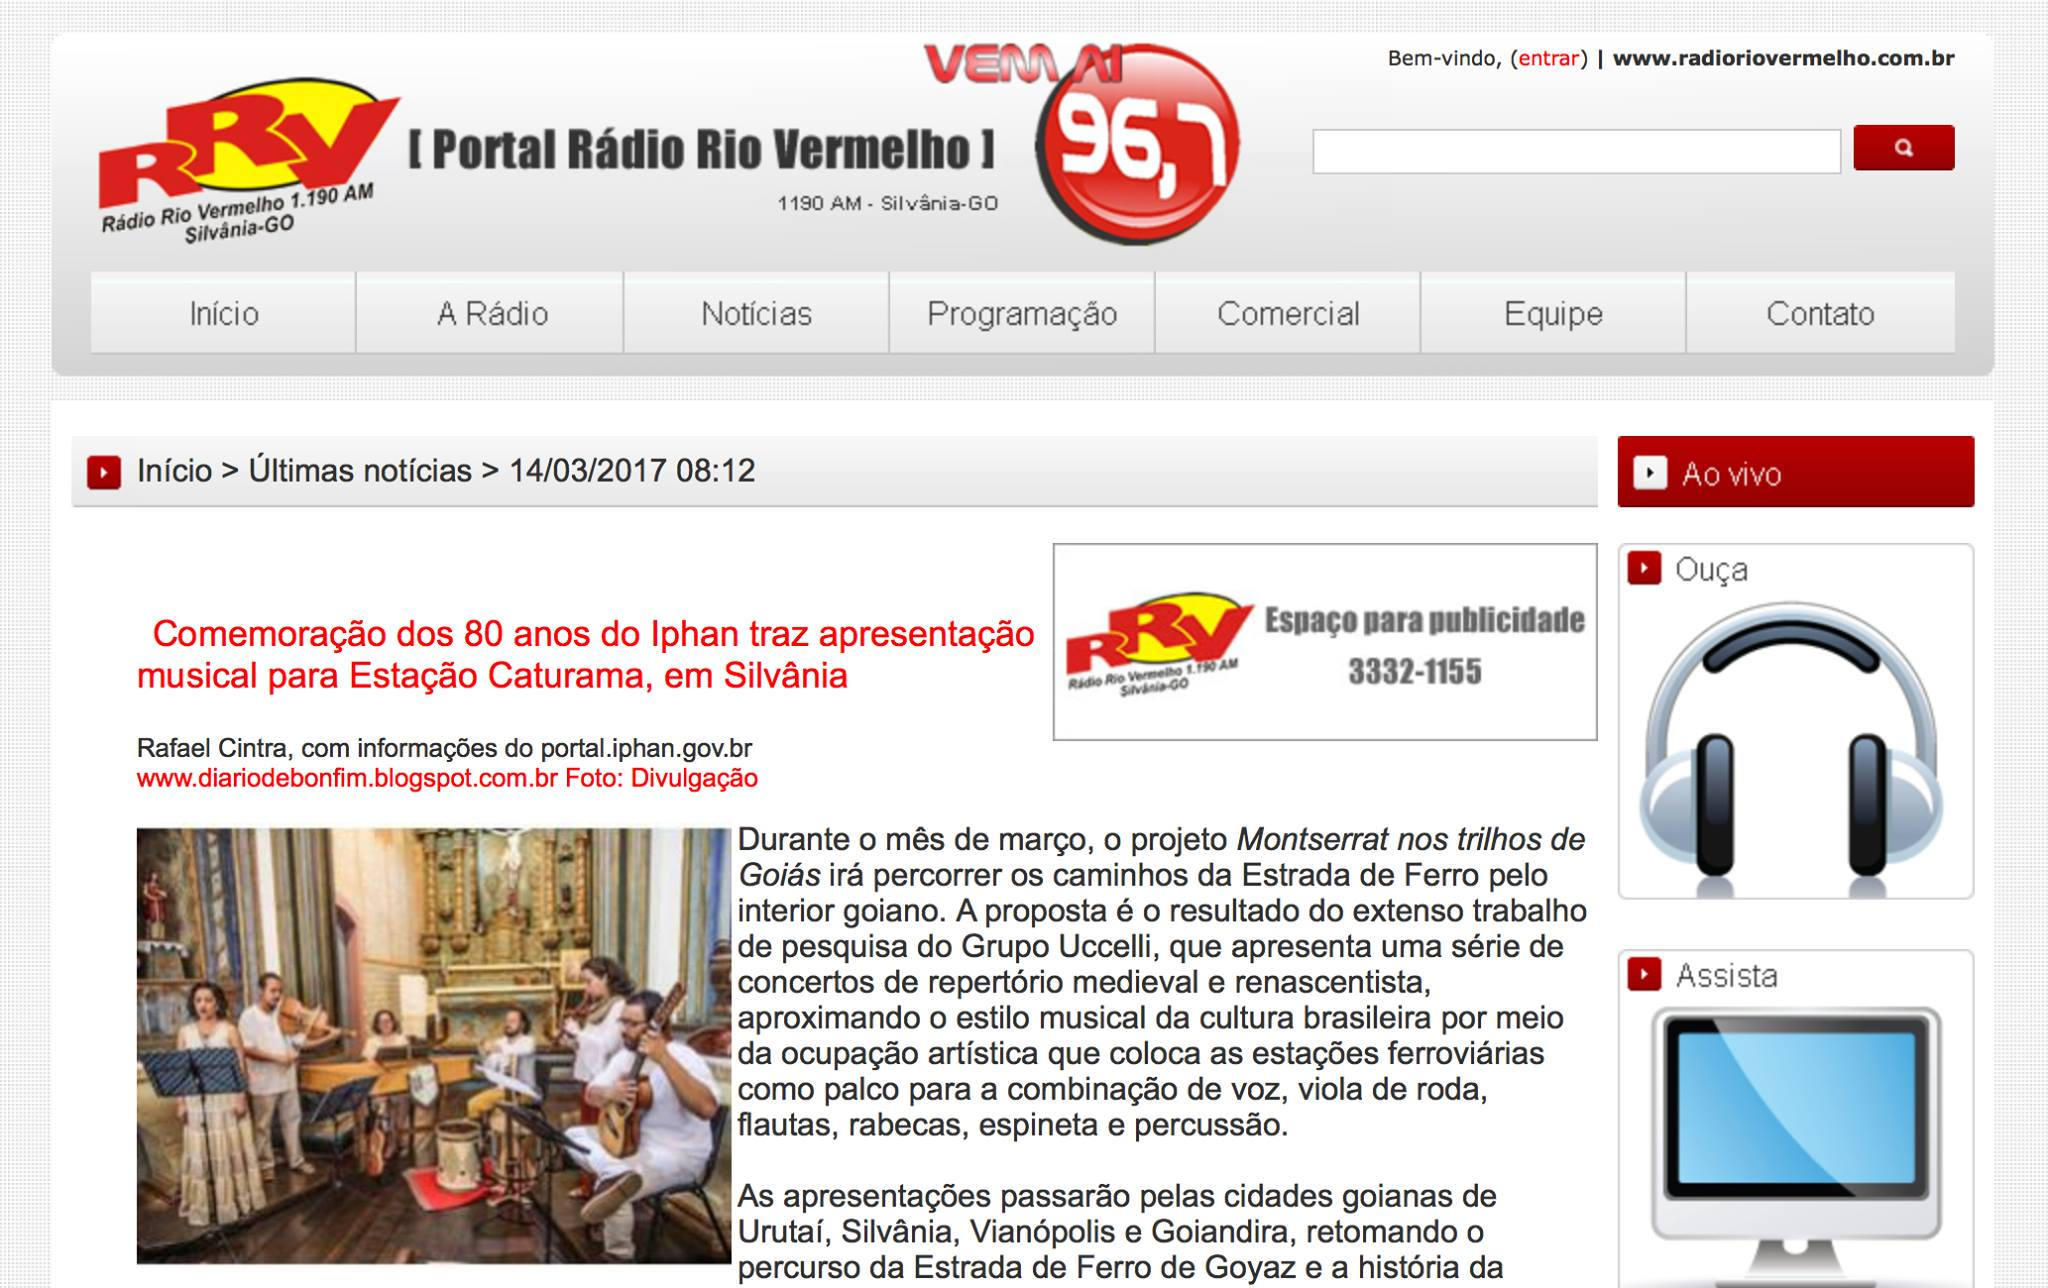 Rádio Rio Vermelho FM (Silvânia/GO)